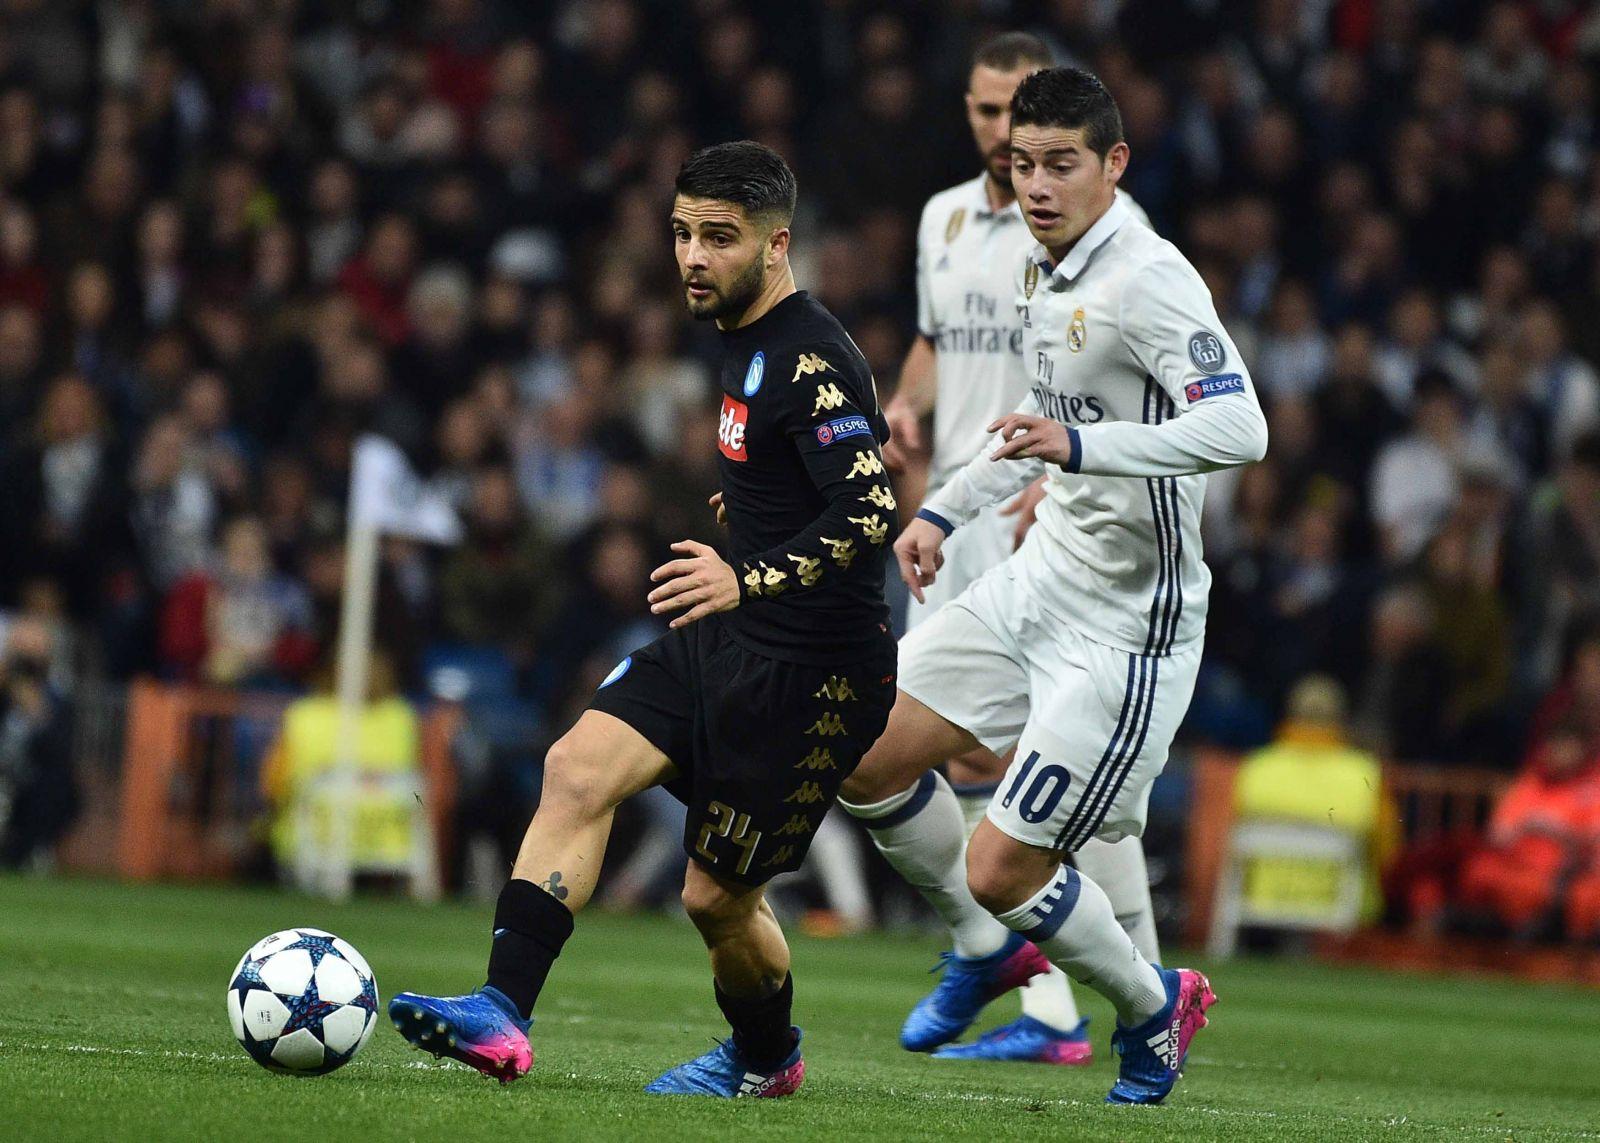 Calciomercato Napoli - James Rodriguez